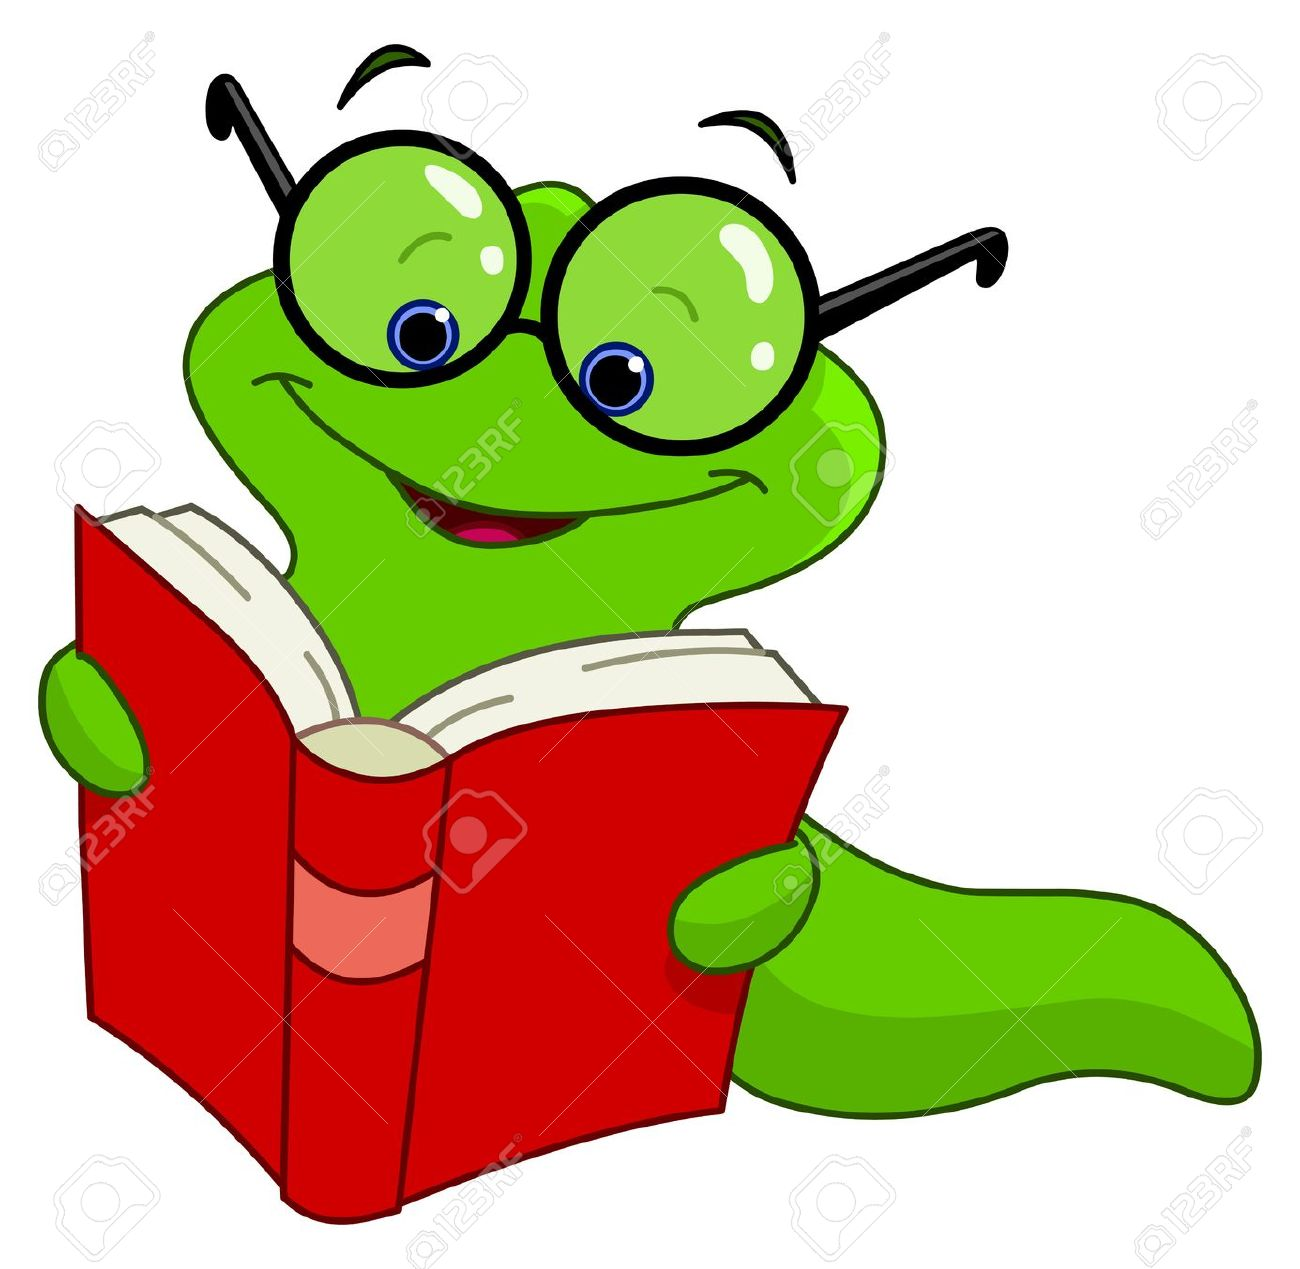 Bookworms free download best. Bookworm clipart clip art